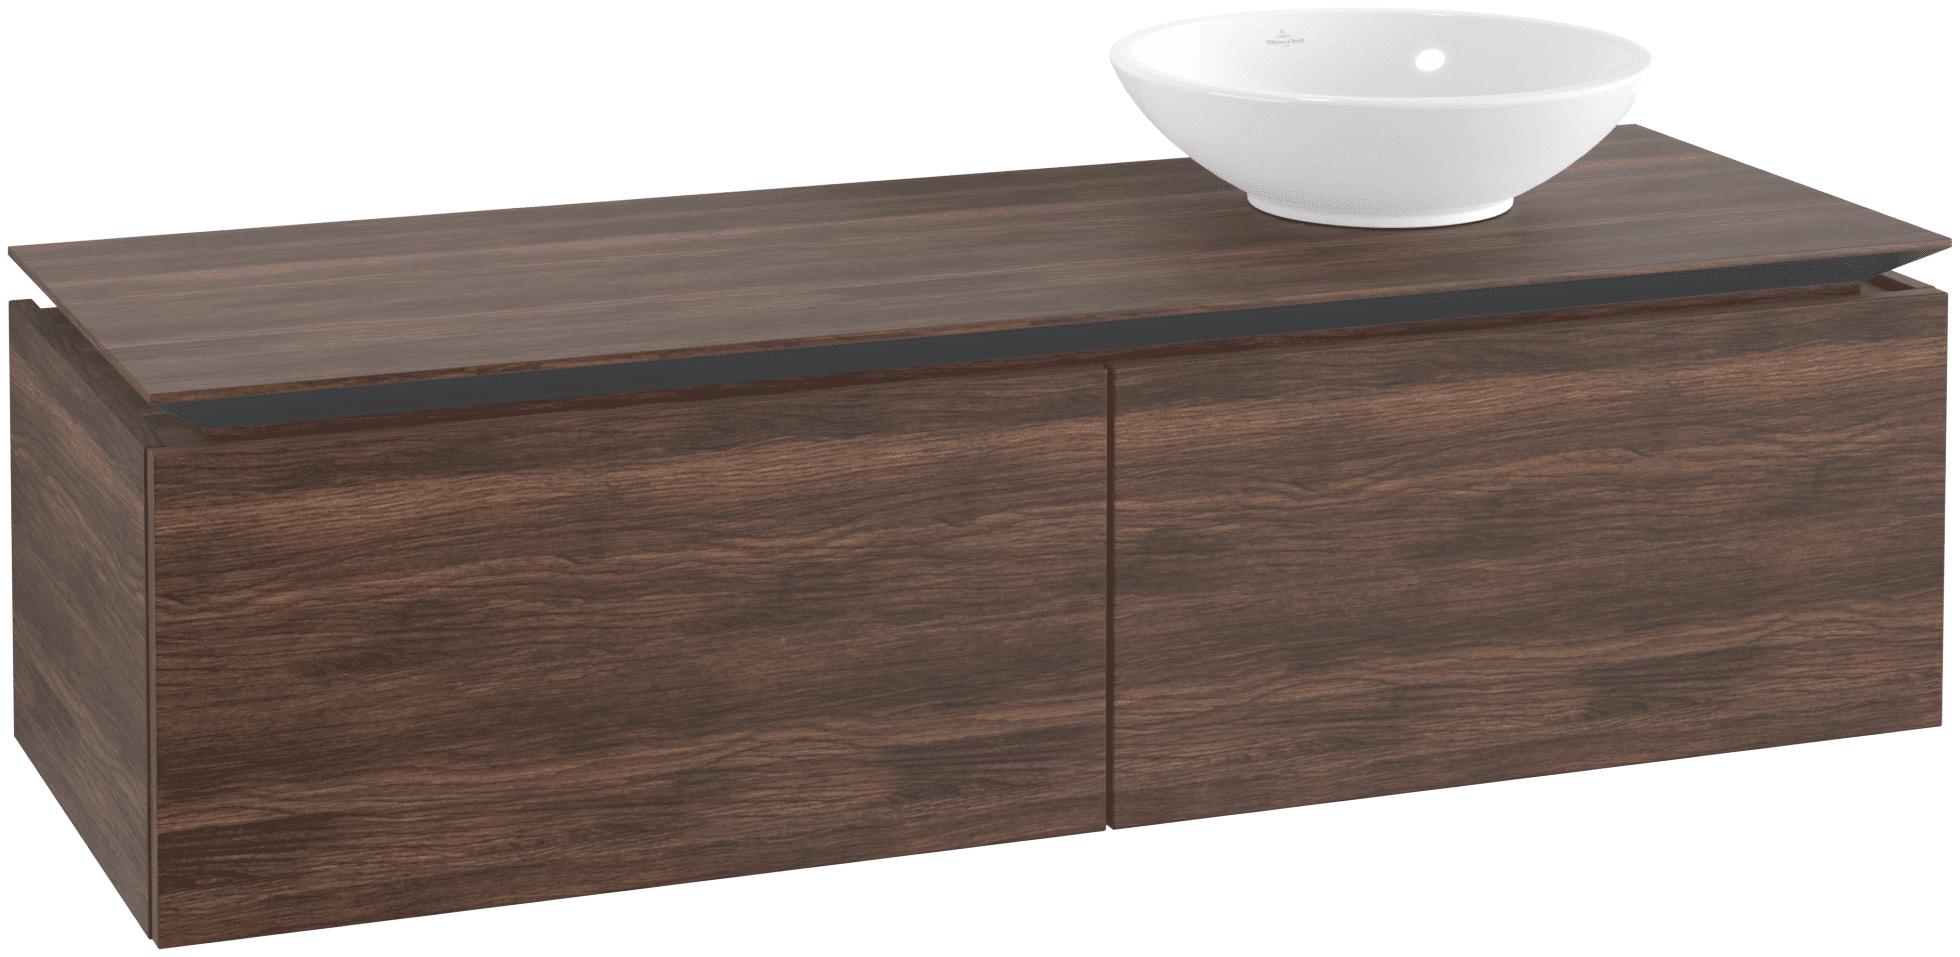 Villeroy & Boch Villeroy & Boch Legato - Meuble sous lavabo with 2 drawers & 1 cut-out right 1400 x 380 x 500mm arizona oak